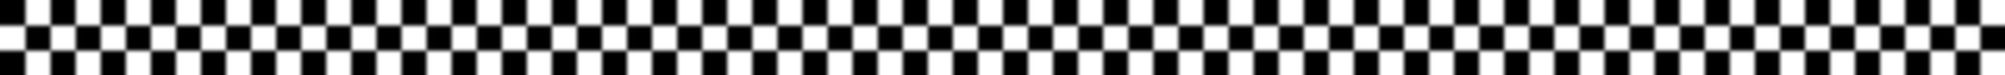 checkered-footer.jpg